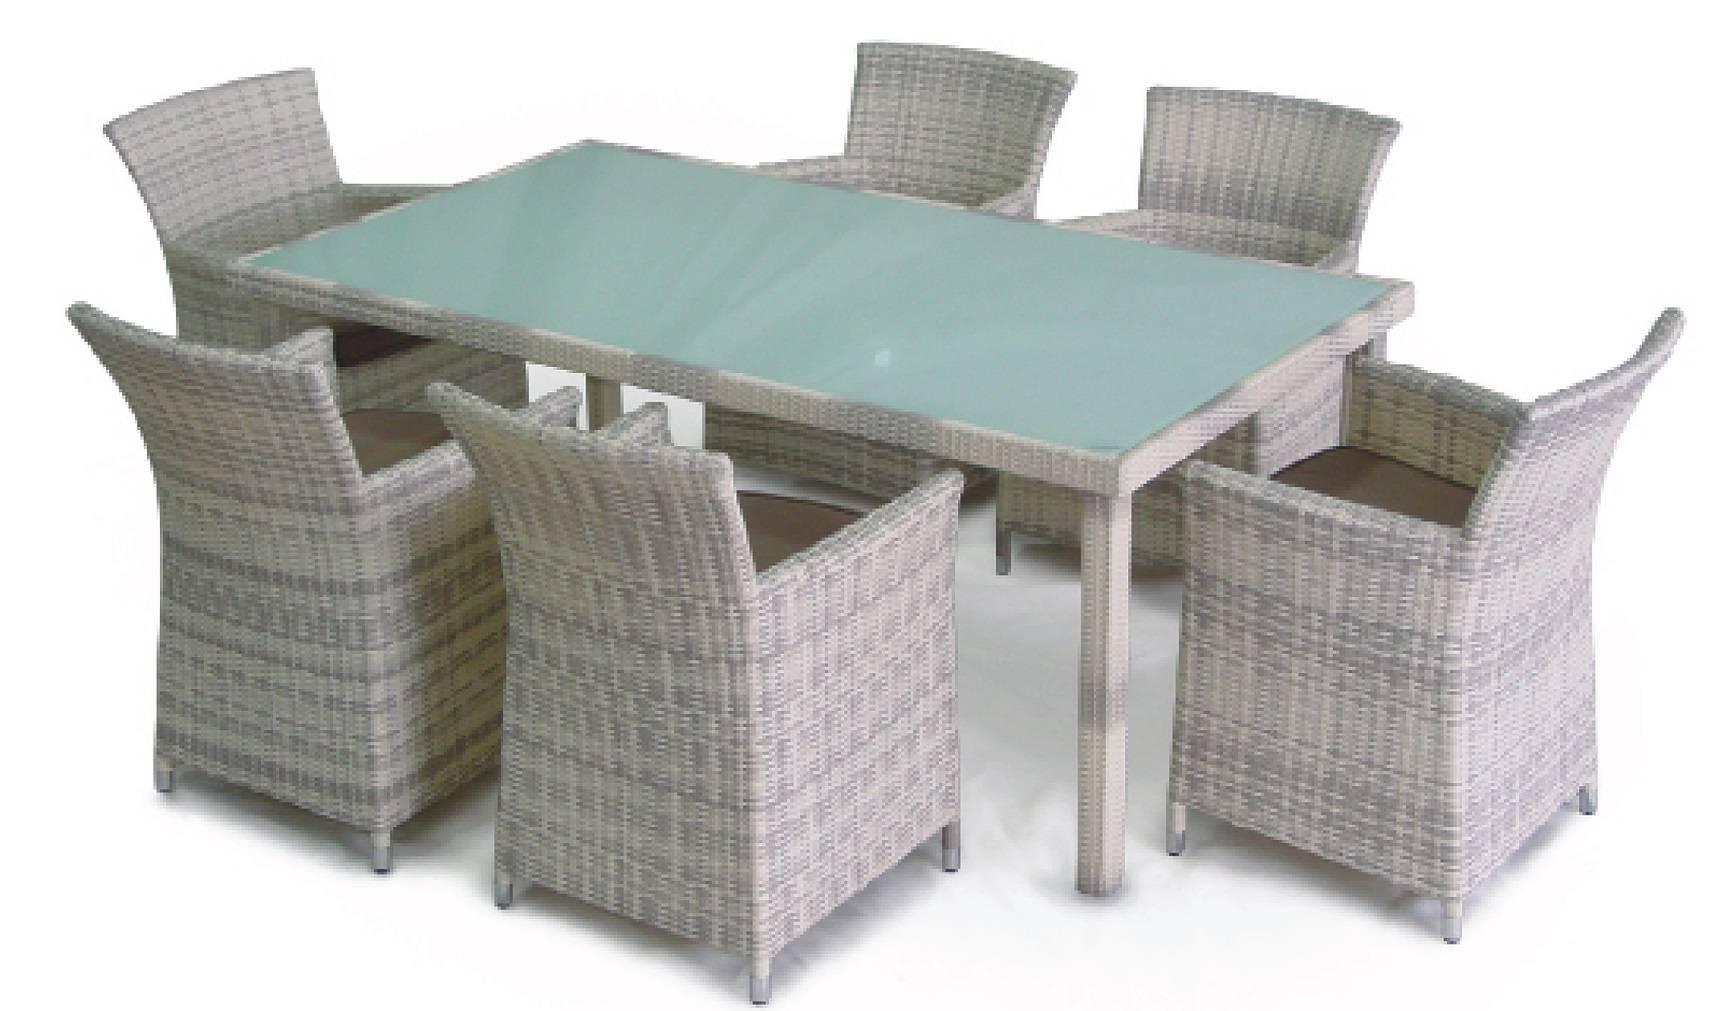 6-seater dining set, outdoor rattan dining furniture